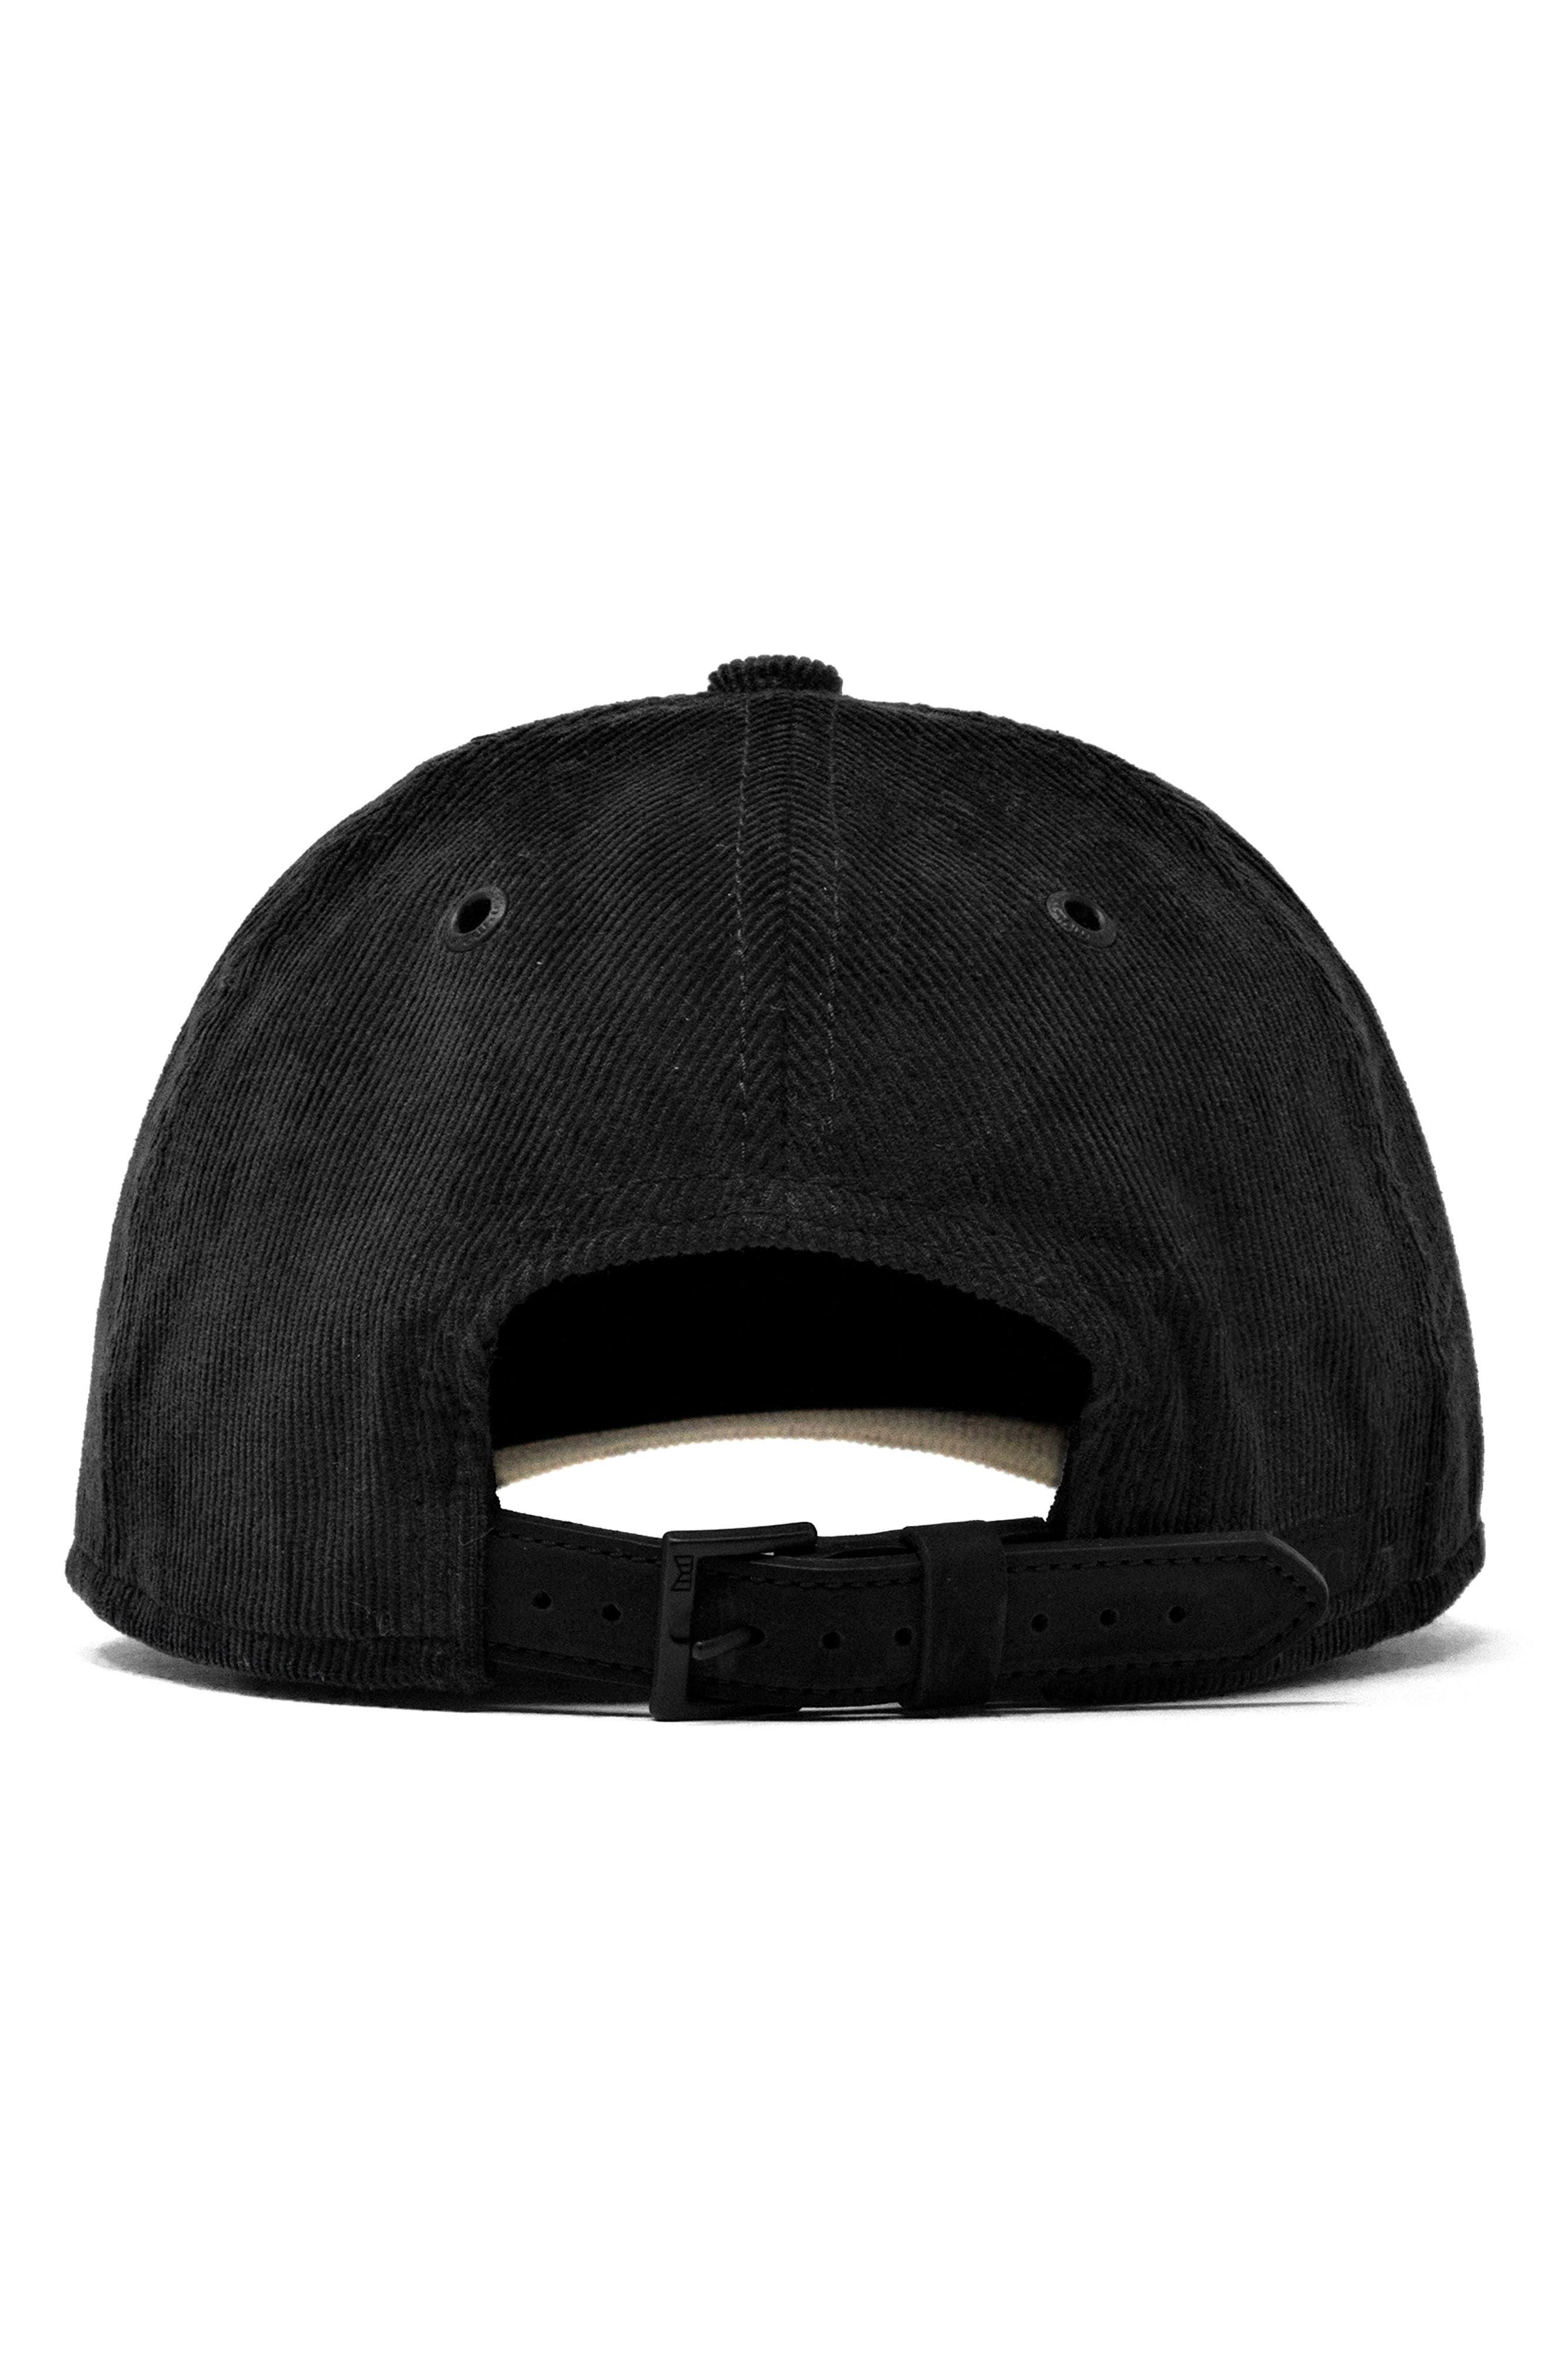 Discovery Baseball Cap,                             Alternate thumbnail 3, color,                             BLACK